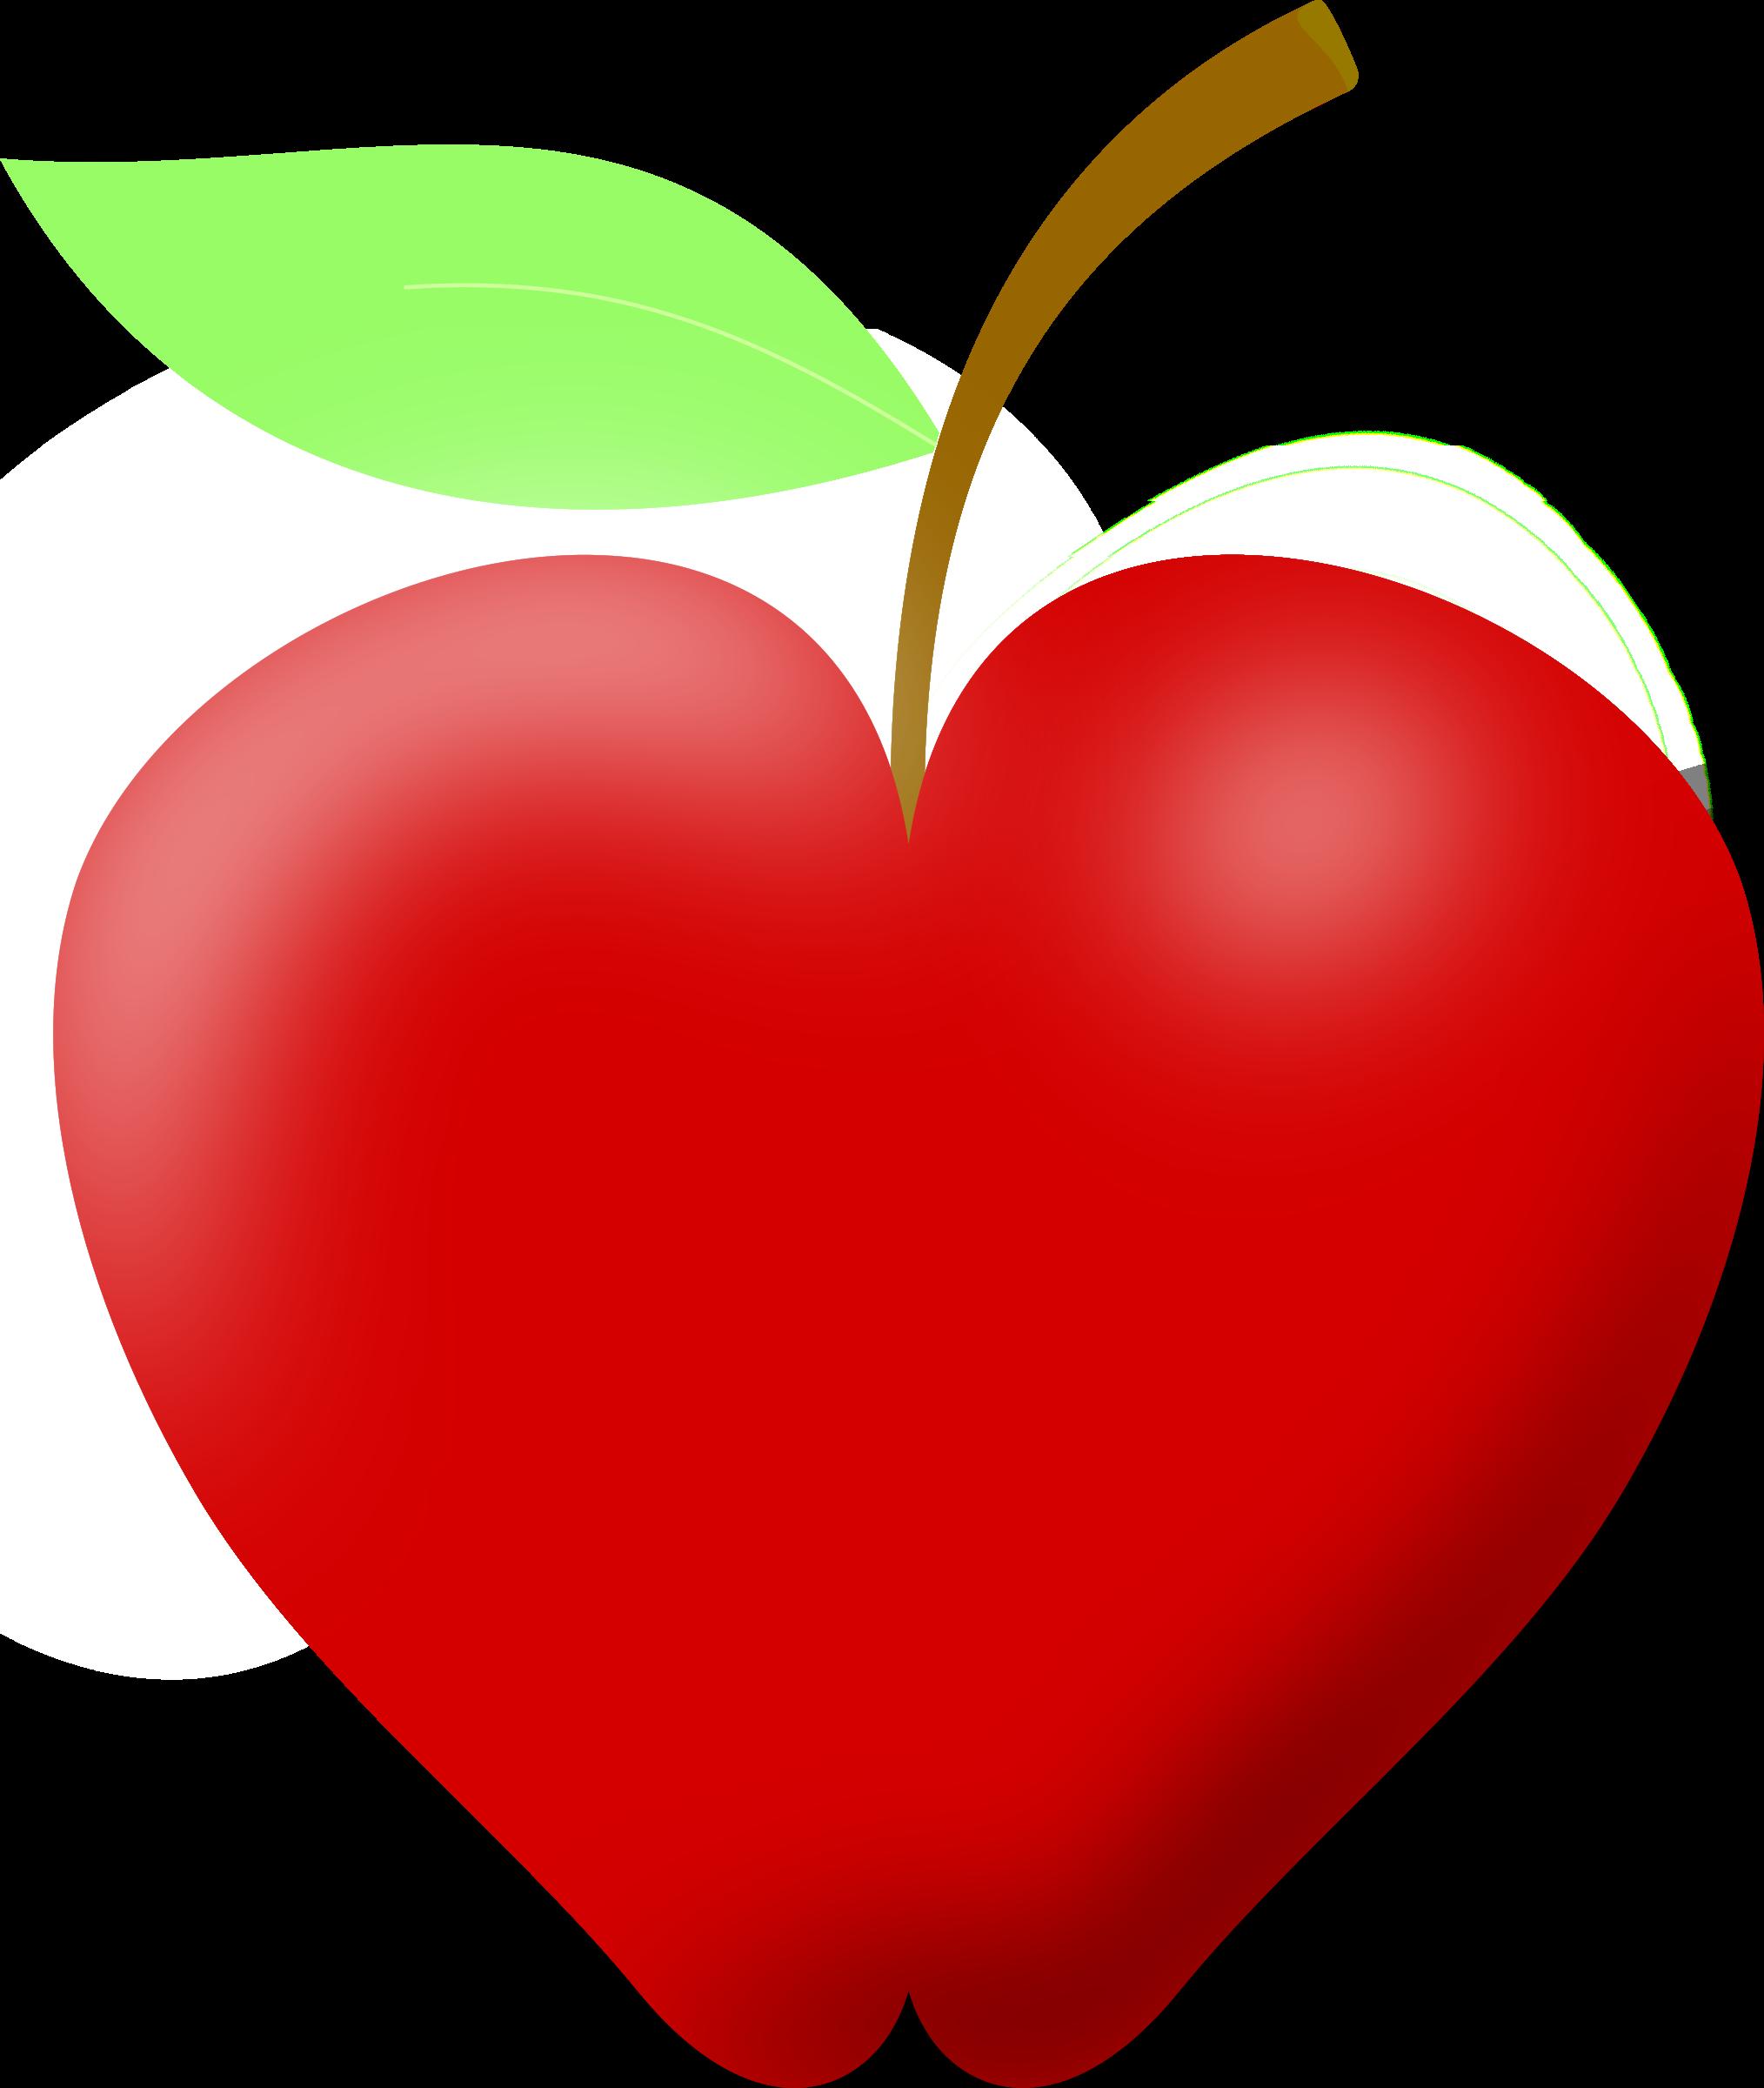 Heart clipart apple #2.